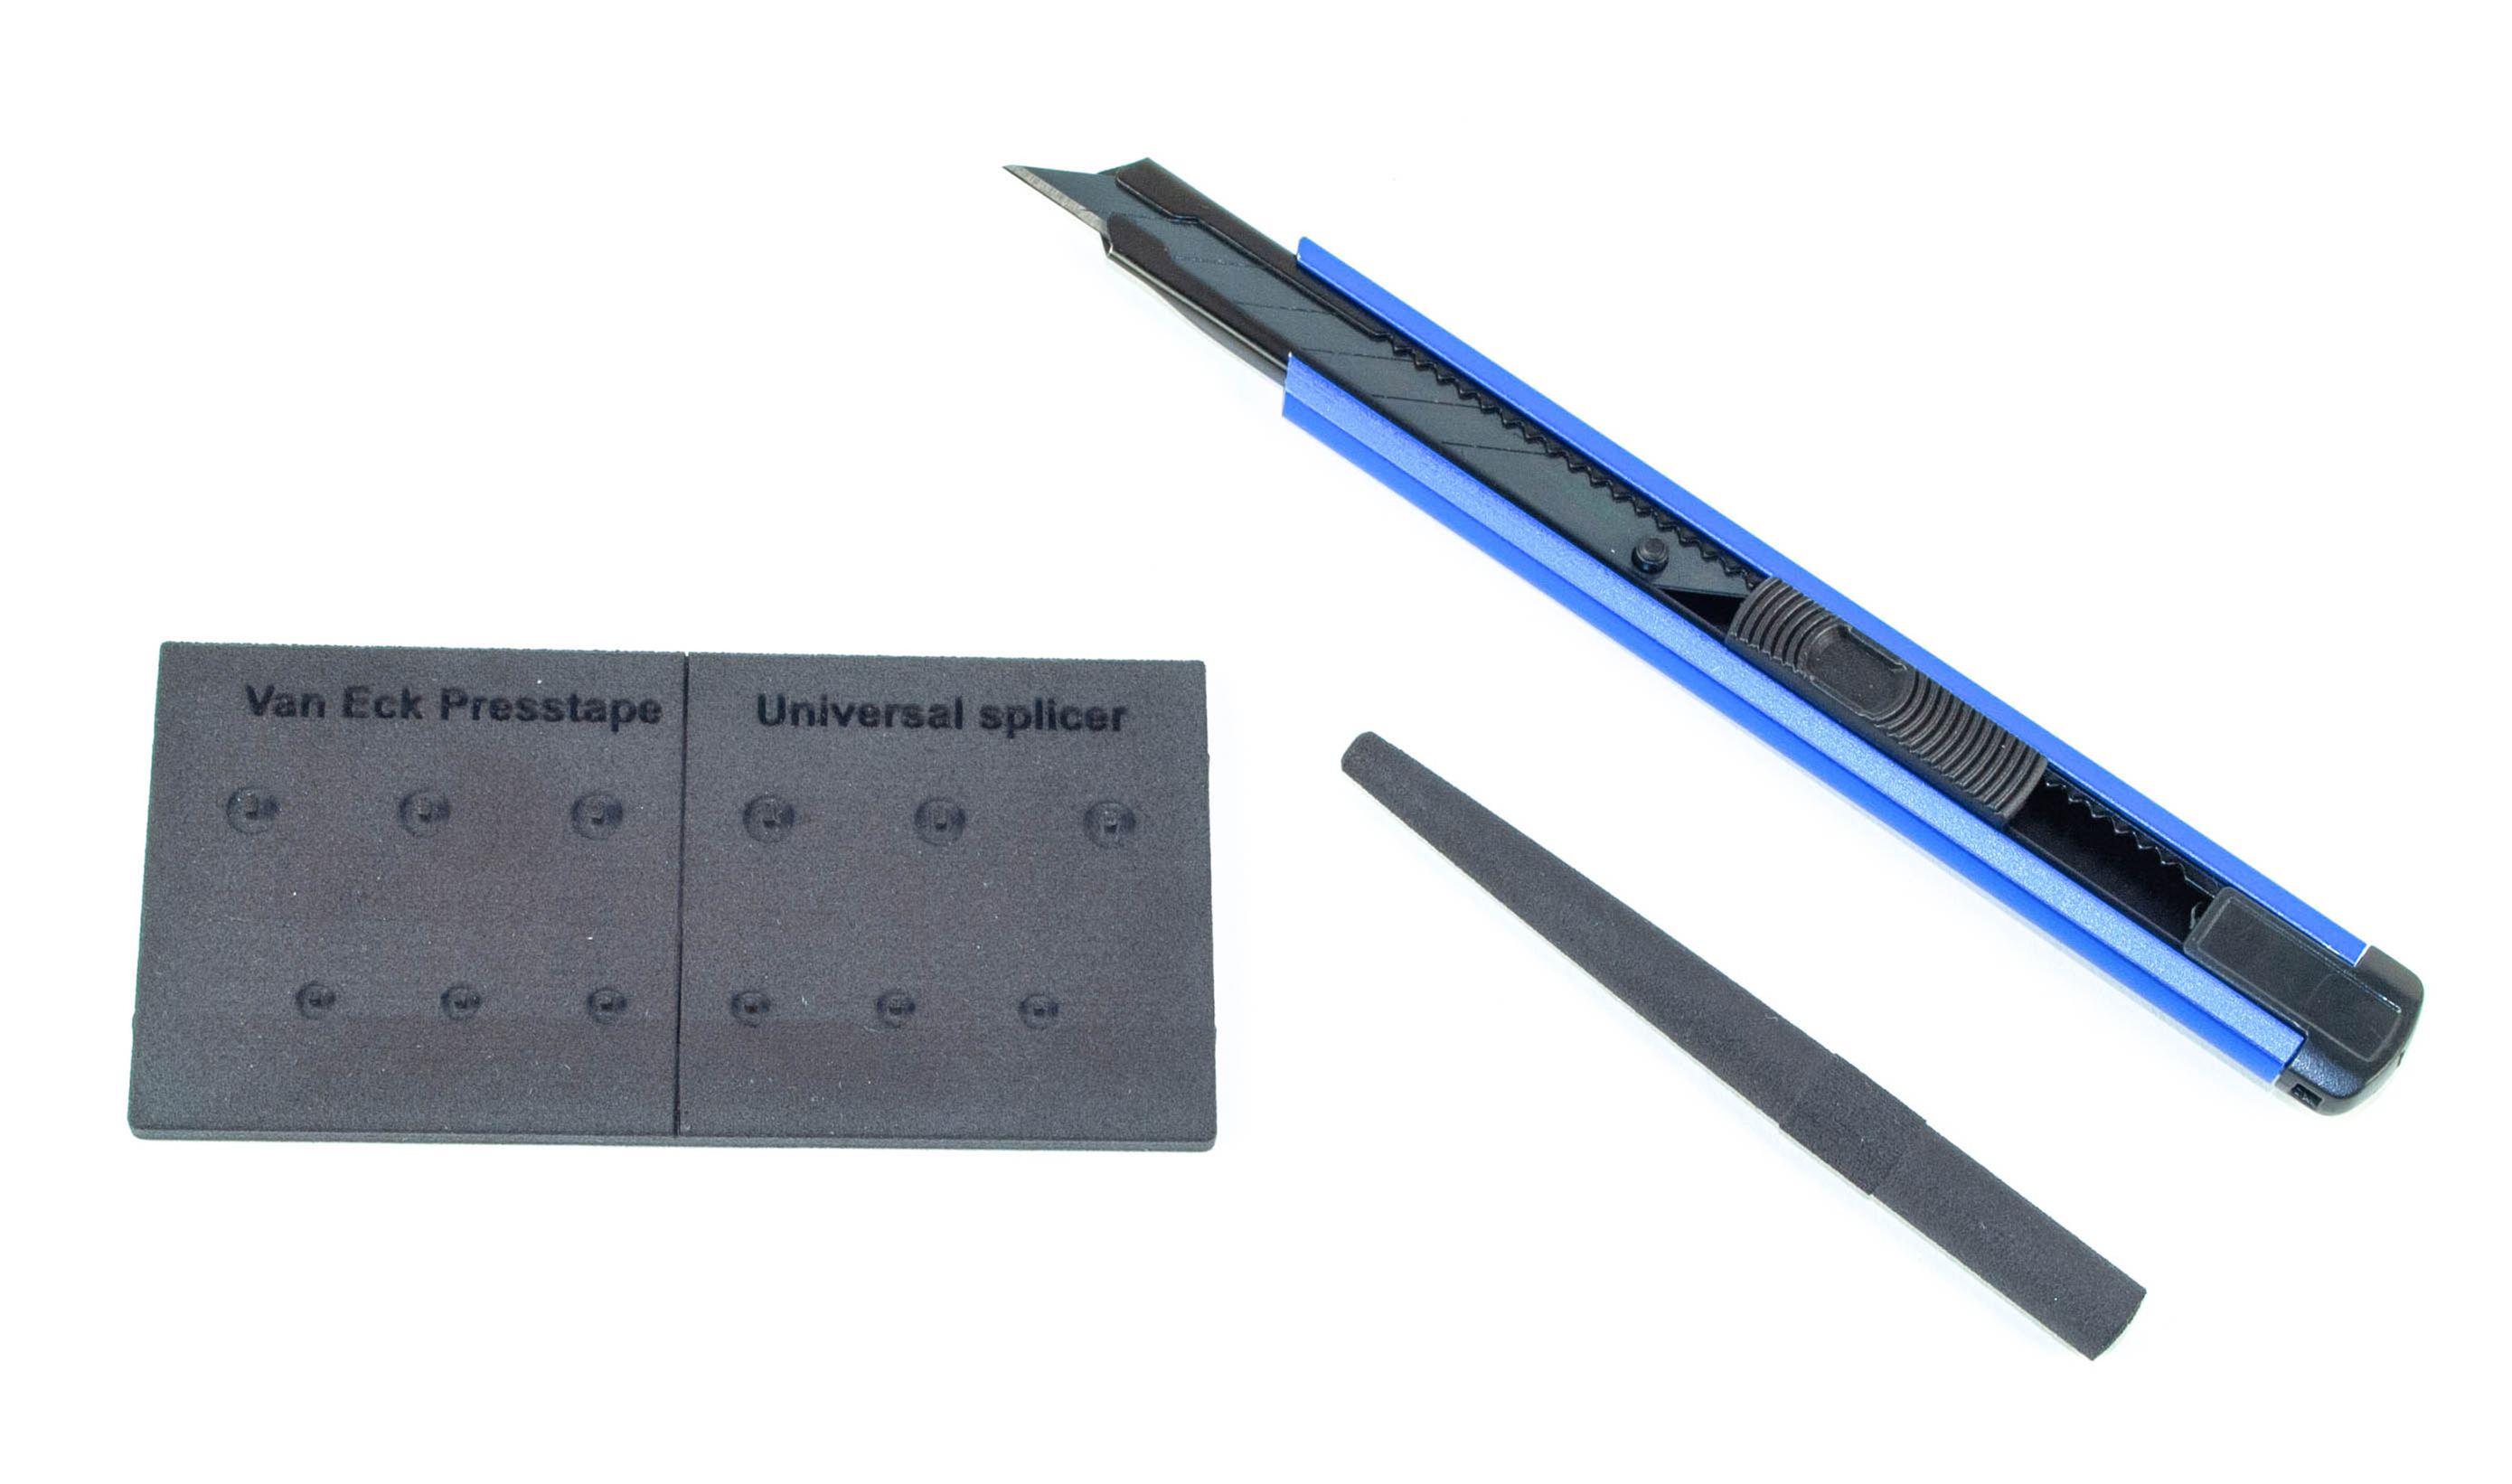 Presstape Universal Splicer